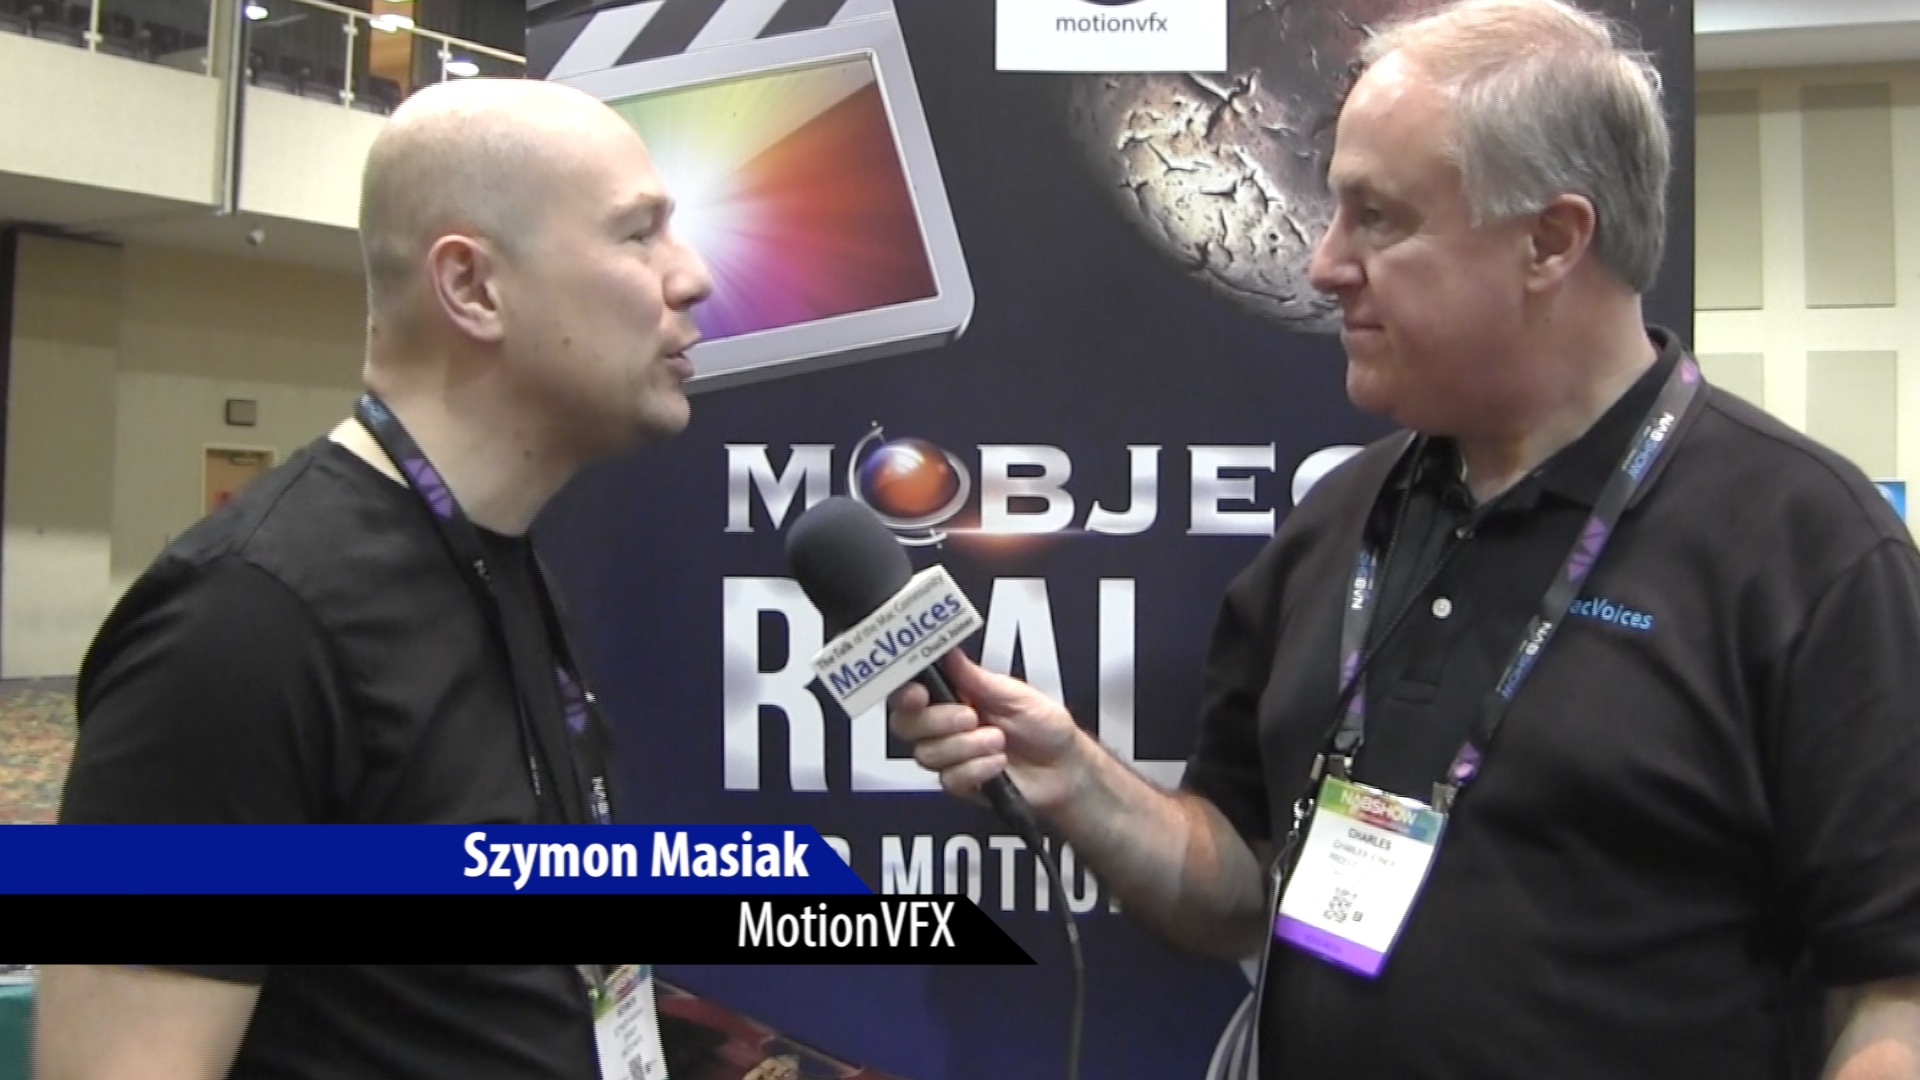 Szymon Masiak, Chuck Joiner